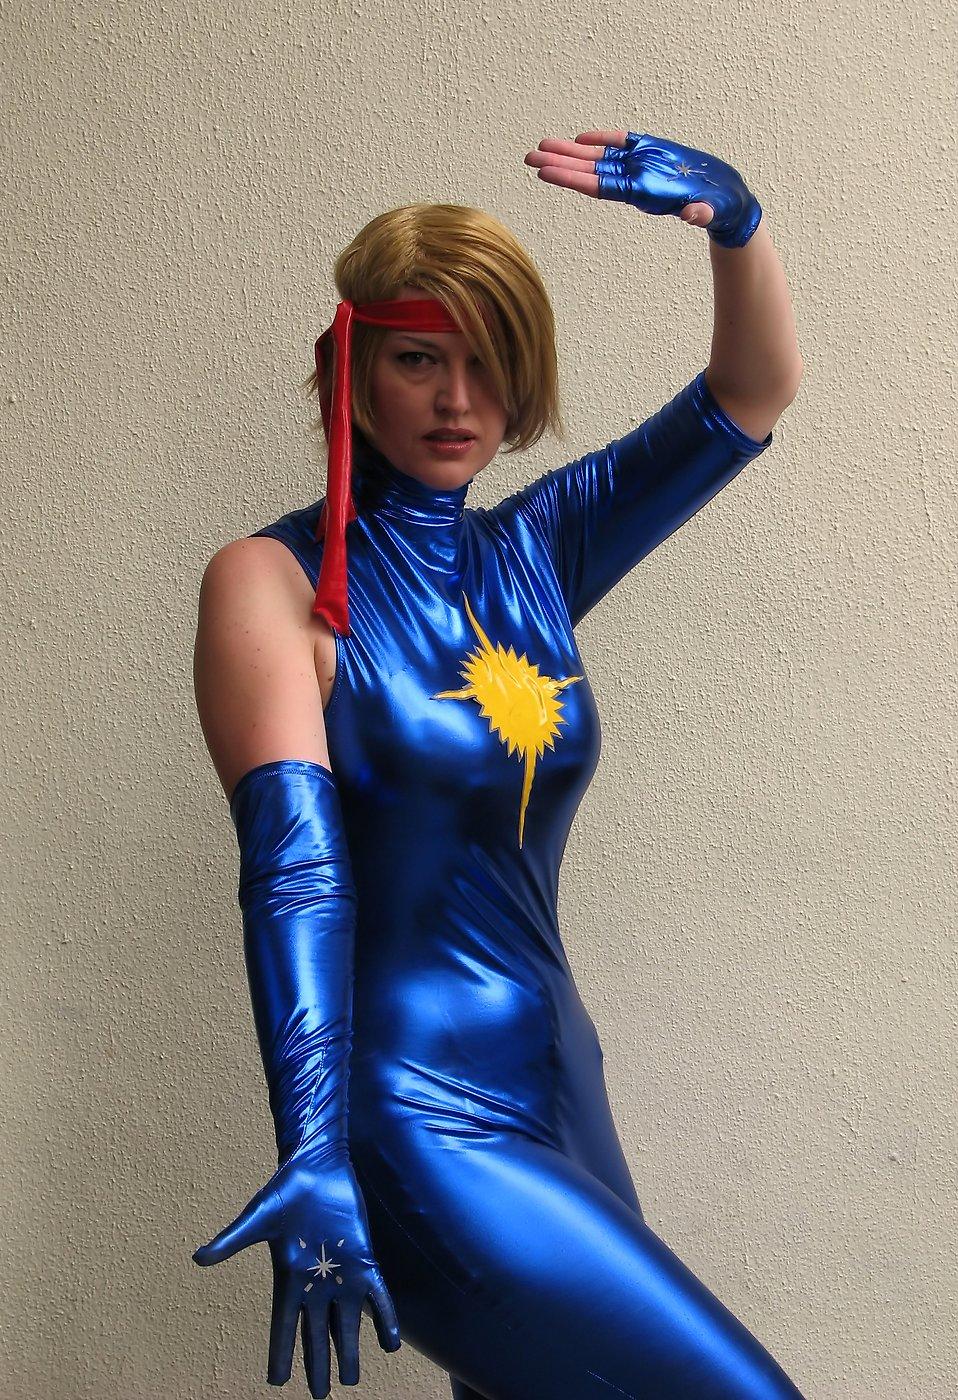 A beautiful woman in a blue costume at Dragoncon 2009 in Atlanta, Georgia : Free Stock Photo